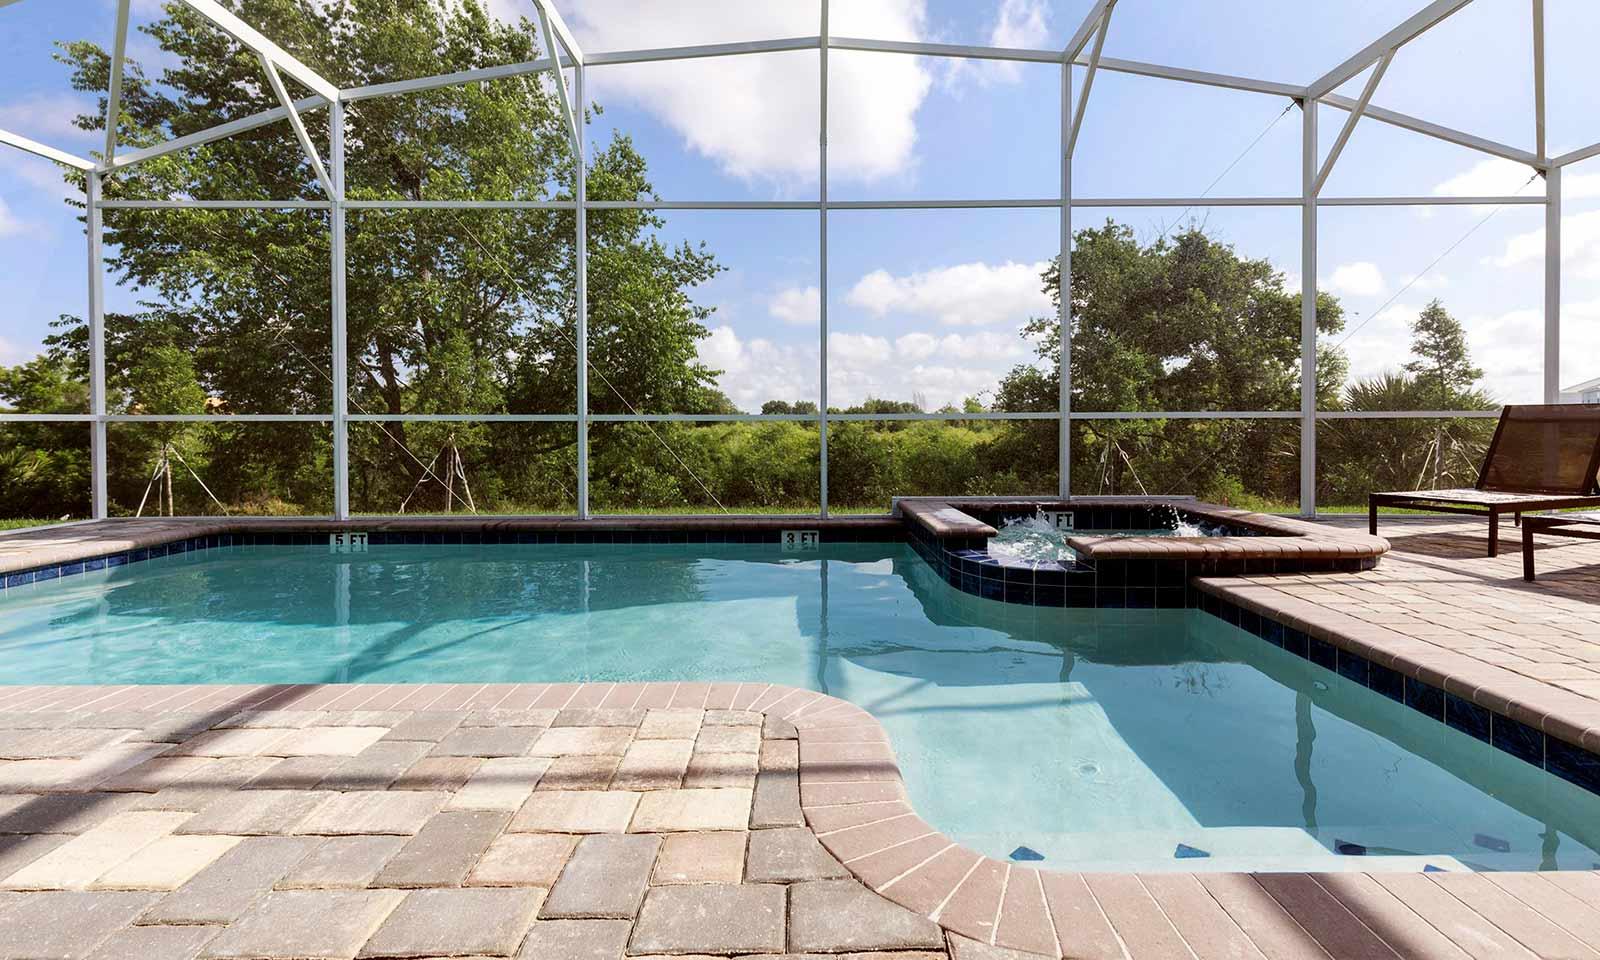 [amenities:screened-in-pool:2] Screened In Pool